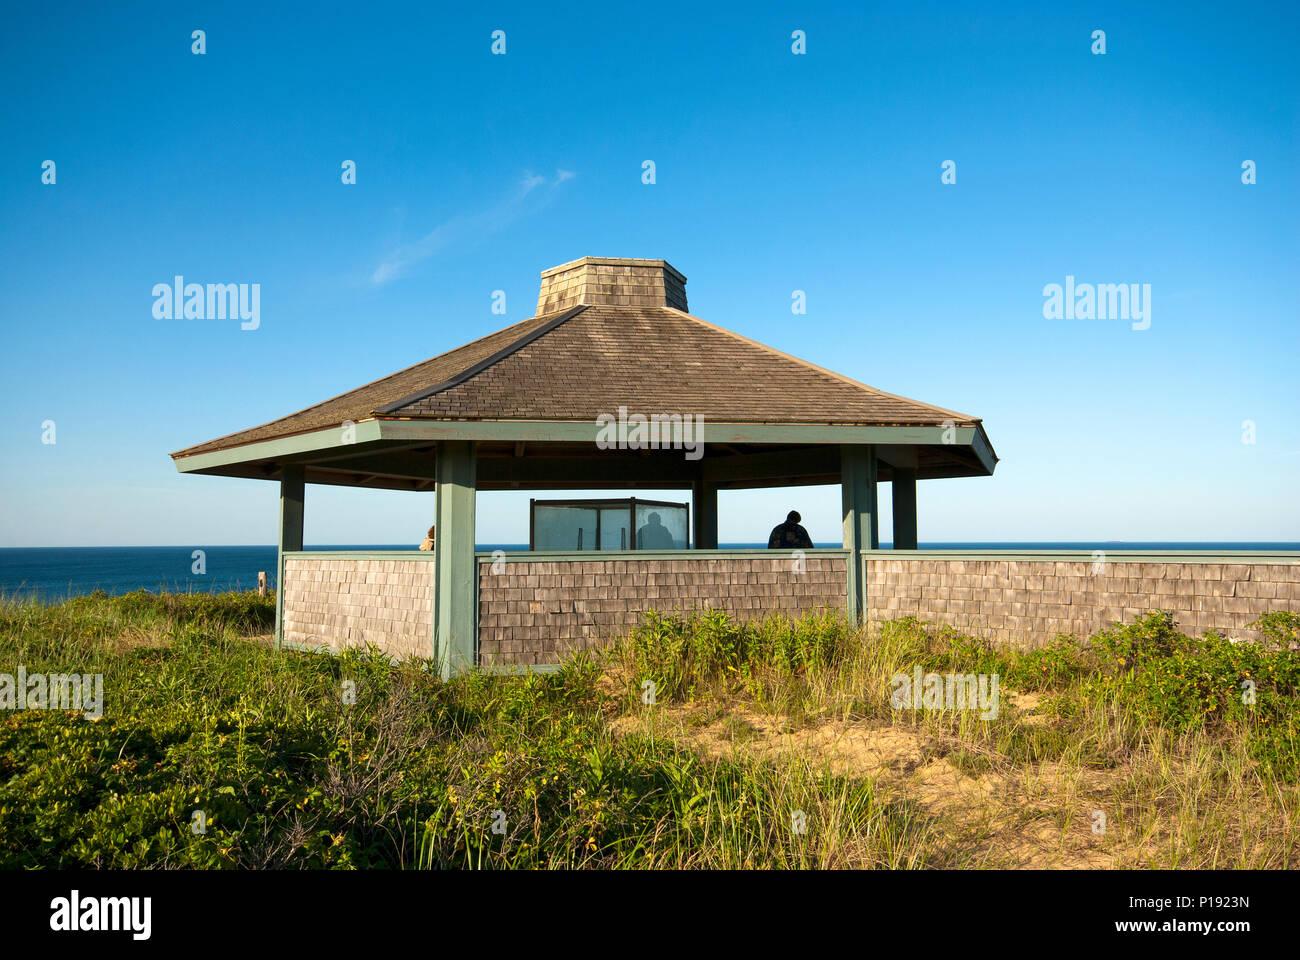 Marconi Transatlantic Wireless Telegraph Station, Wellfleet, Barnstable County, Cape Cod National Seashore, Massachusetts, USA - Stock Image